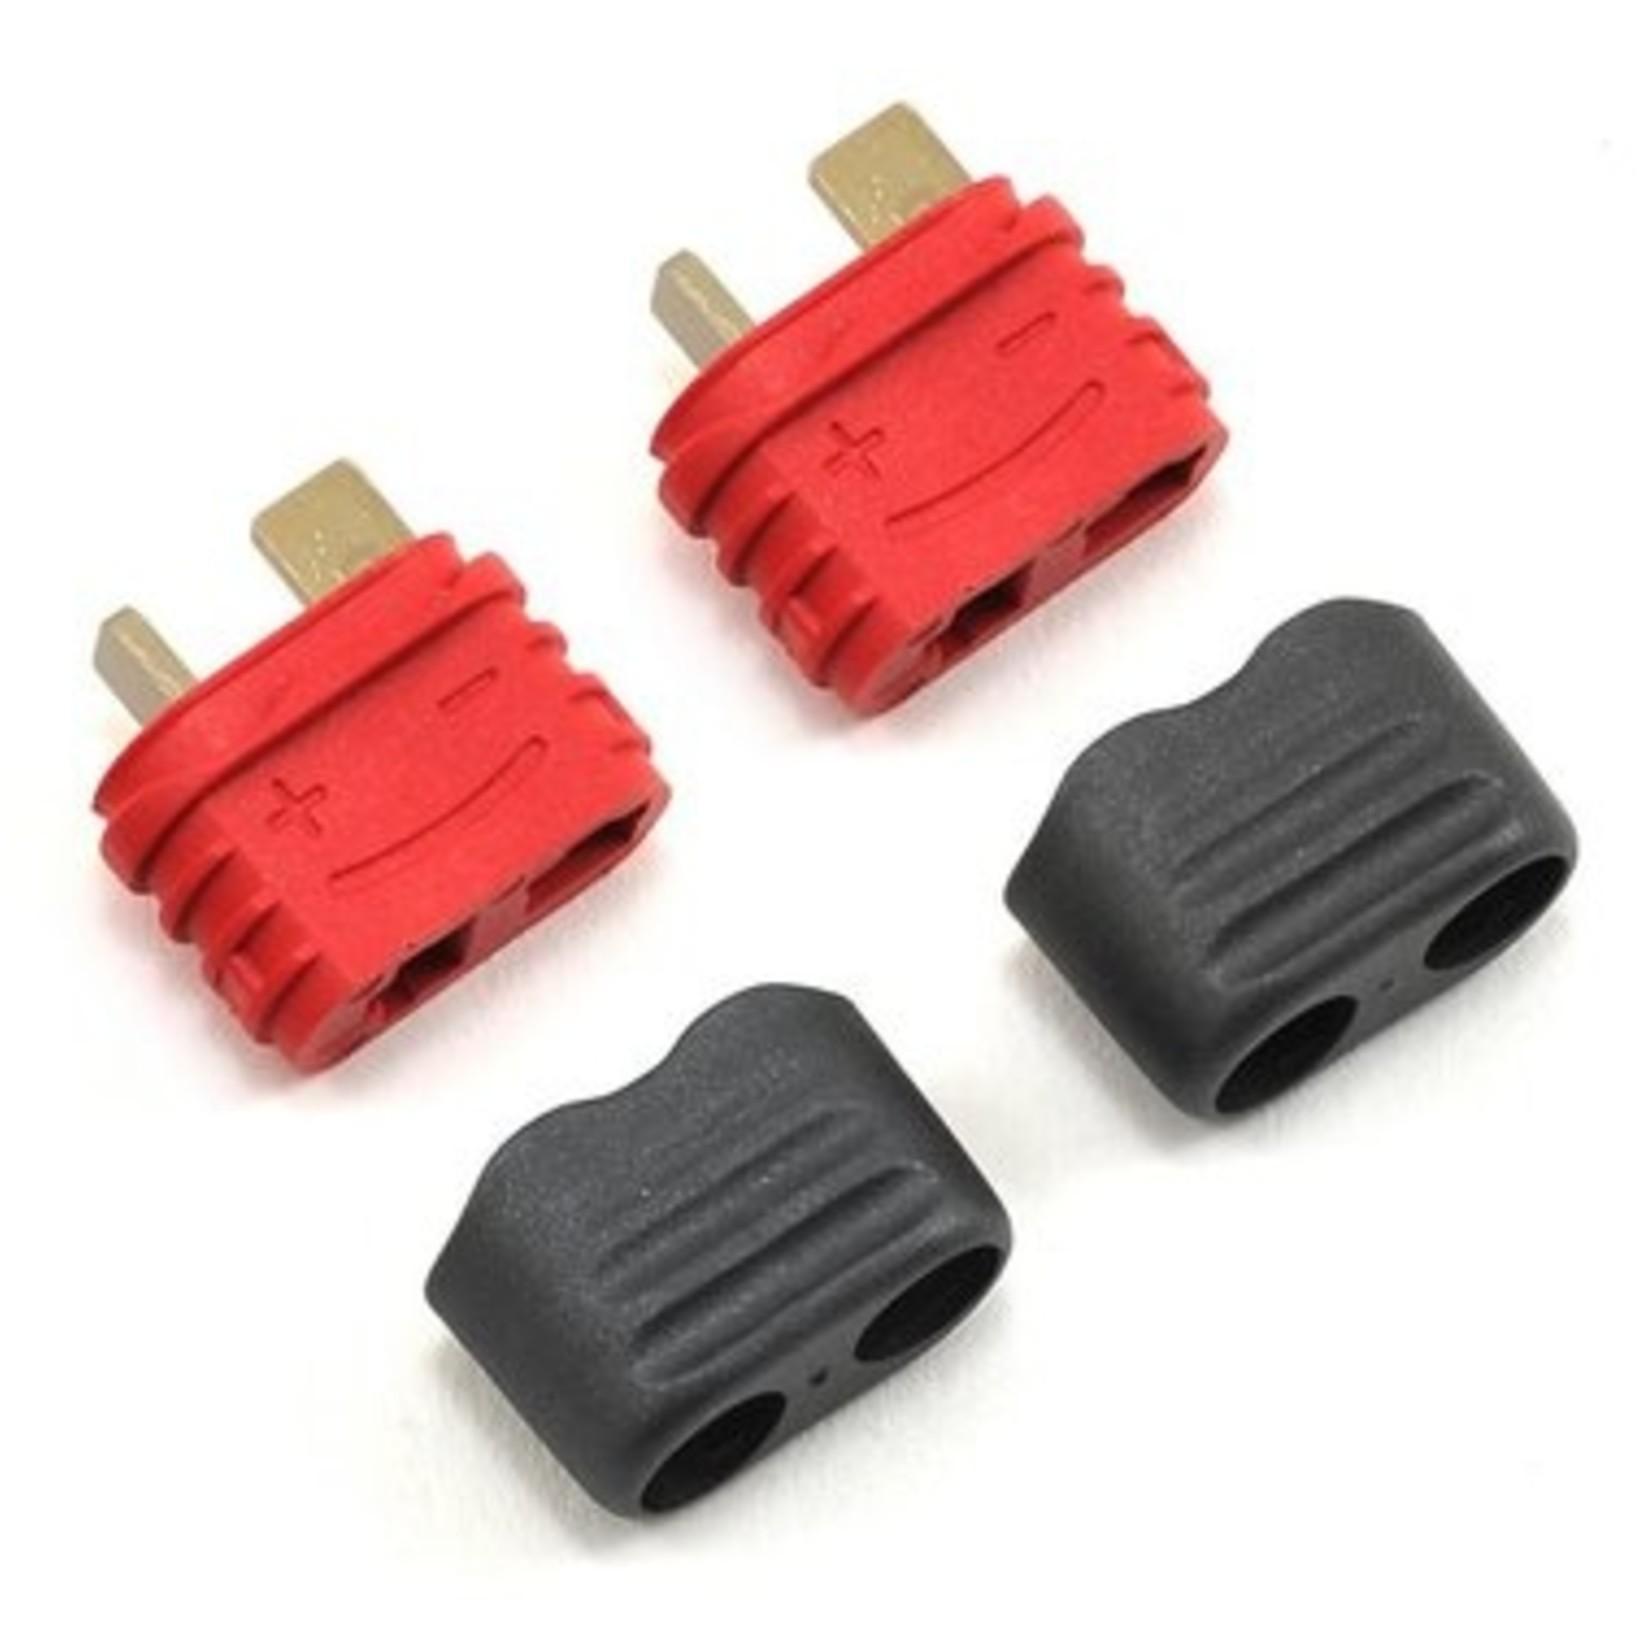 ProTek RC PTK-5041  ProTek RC Sheathed T-Style Plug (1 Male/1 Female)